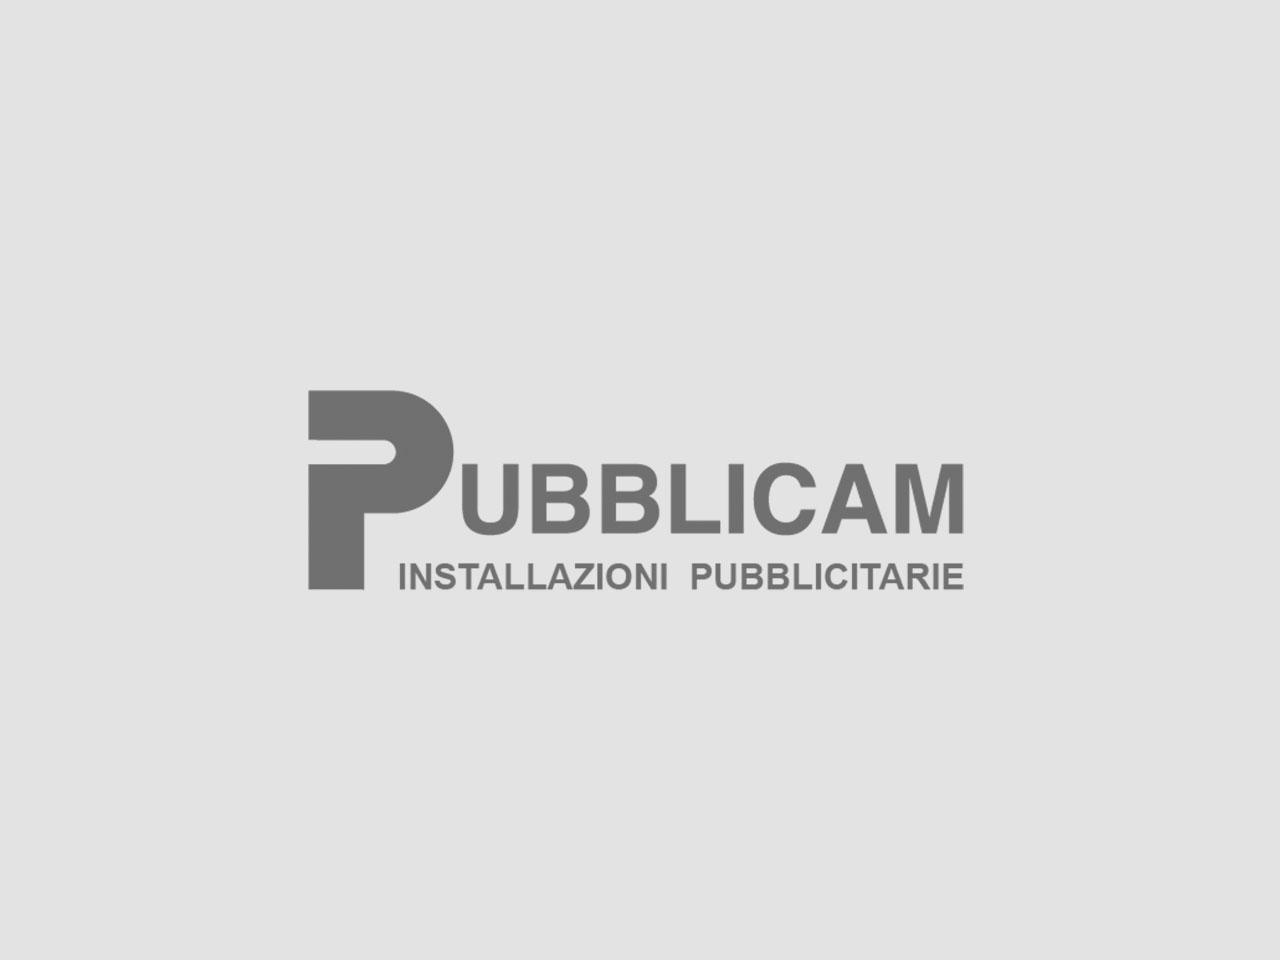 siti-internet-seo-newsletter-social-network-pubblicam-contessifostinelli